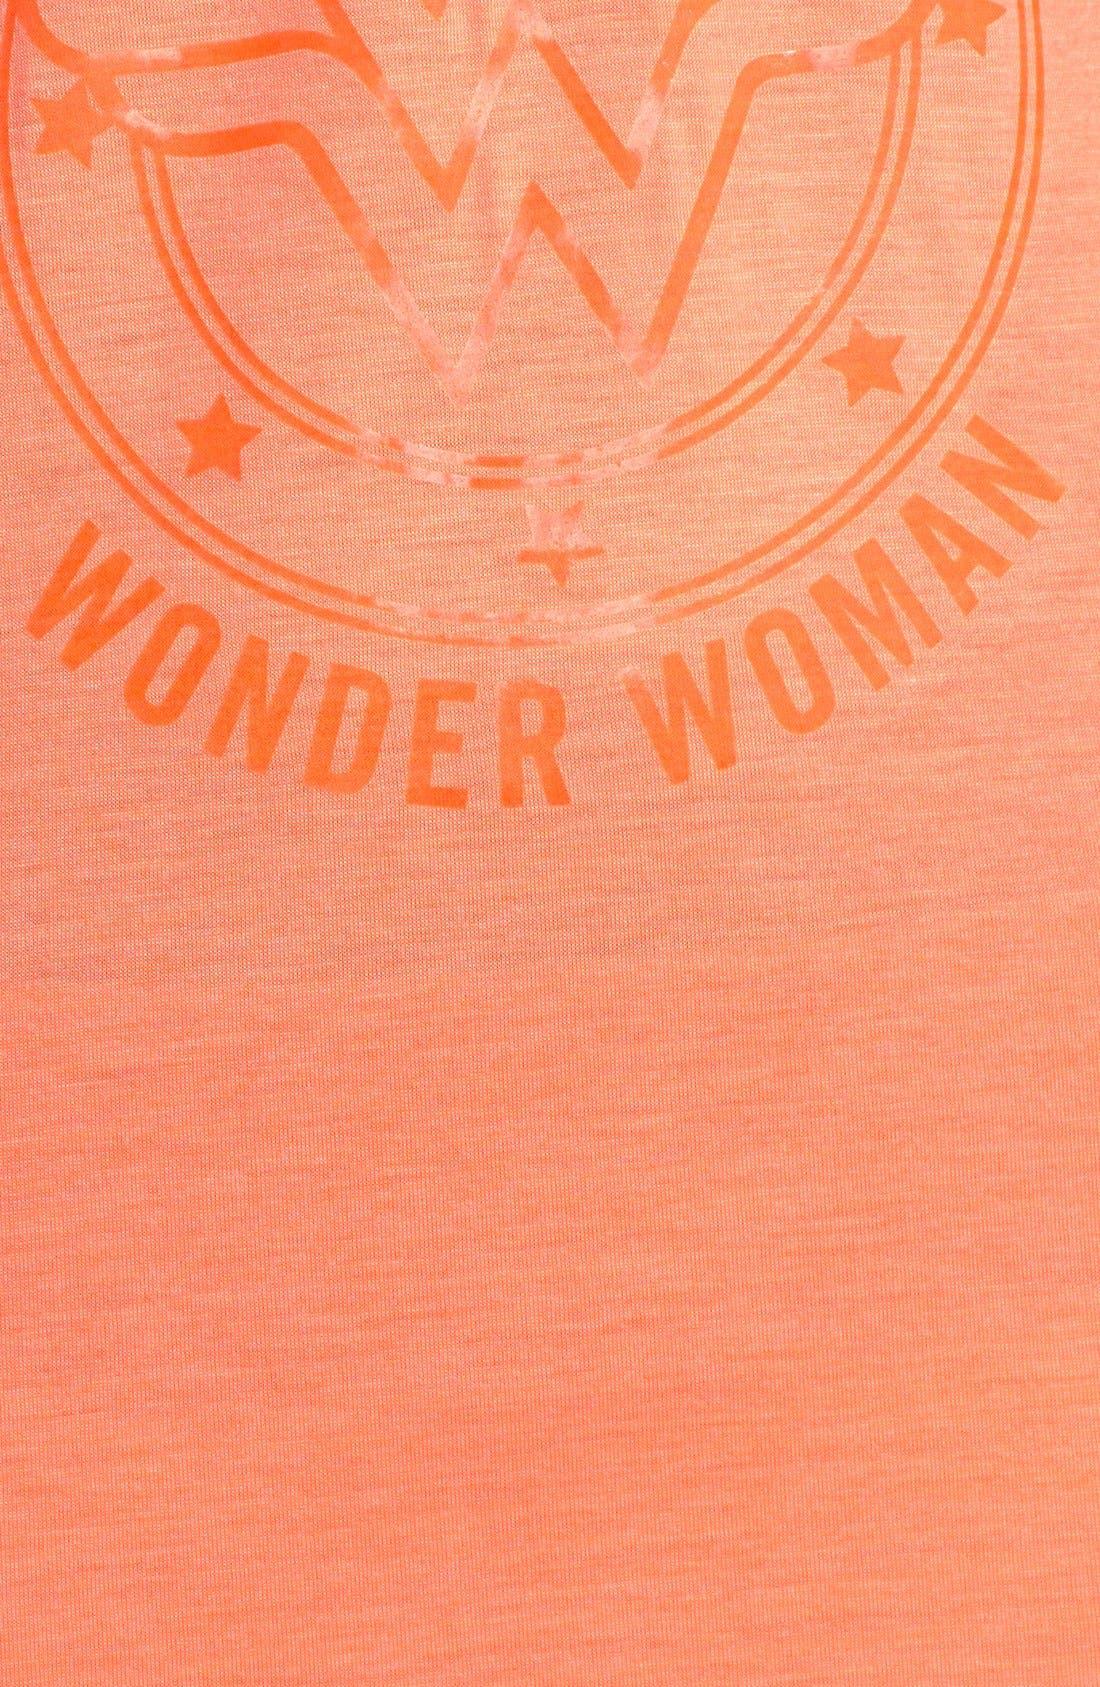 Alternate Image 4  - Under Armour 'Alter Ego - Wonder Woman' Racerback Tank